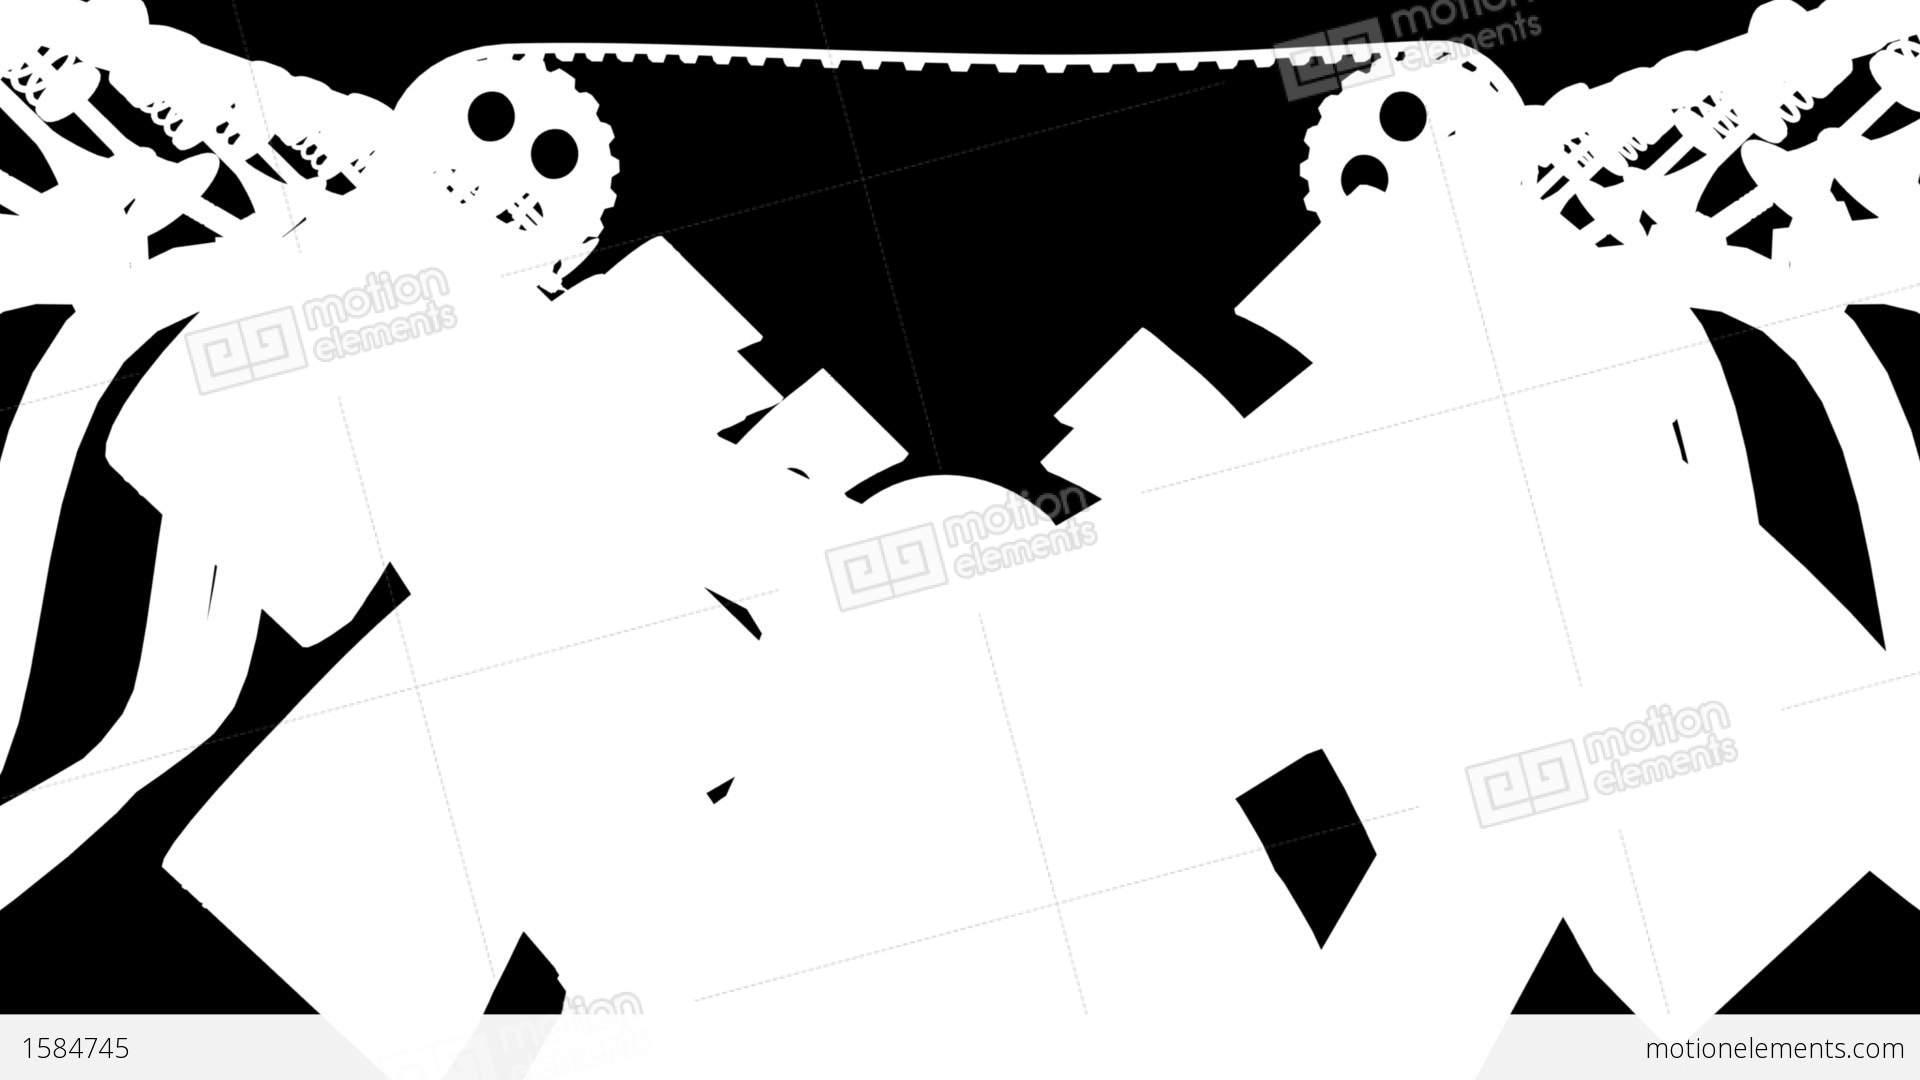 V12 Engine Front Animation Loop Alpha Hd Stock Animation